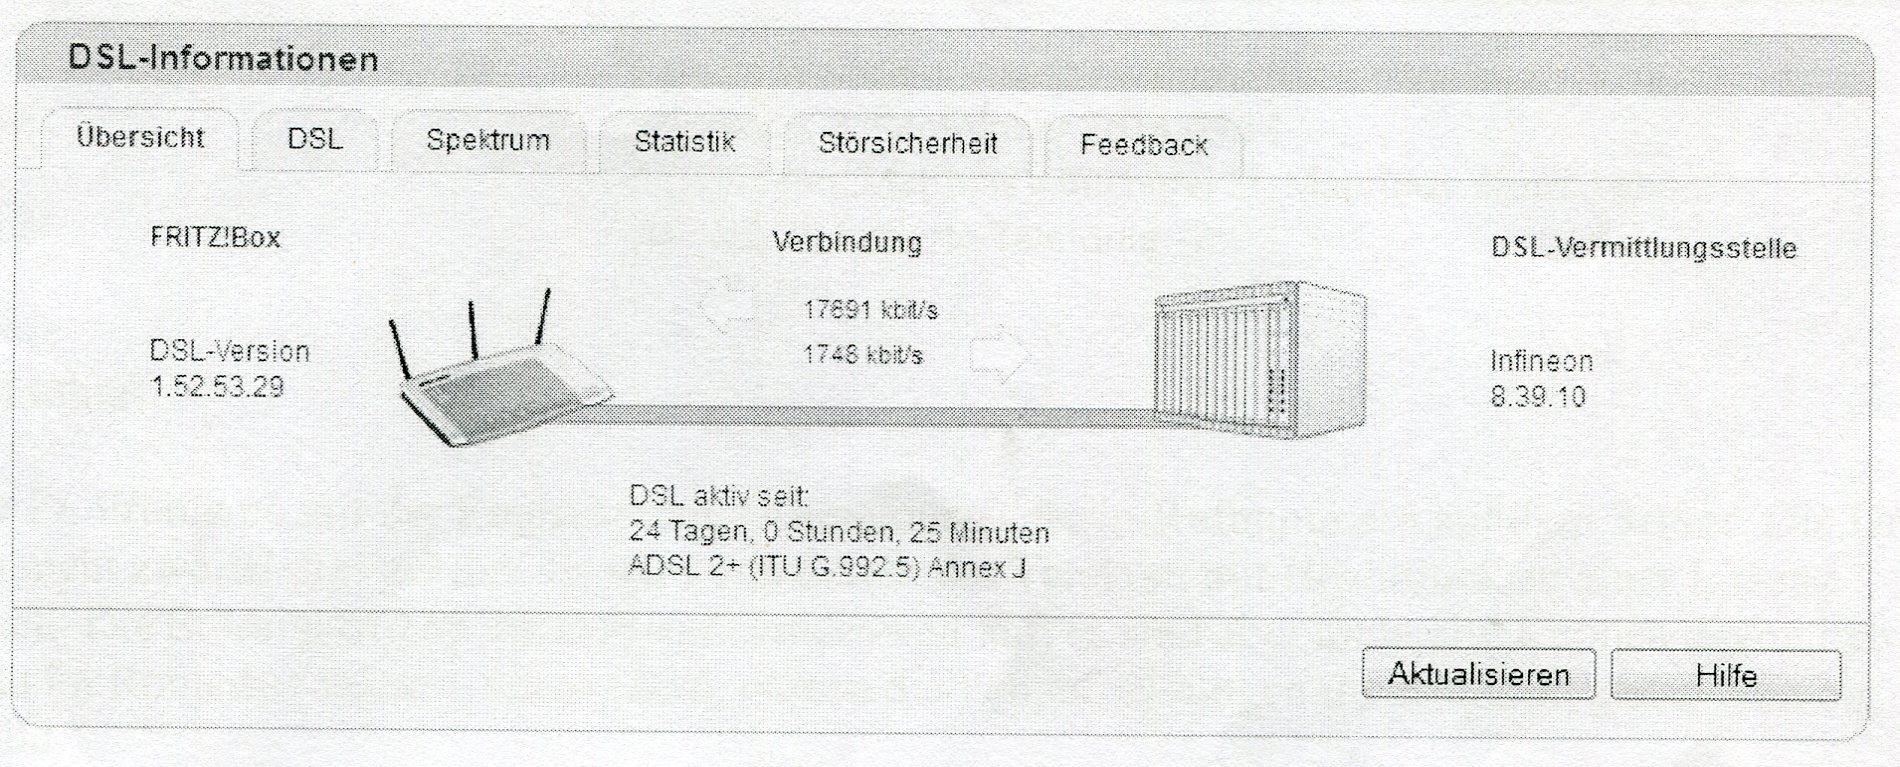 Netzwerktechnik_Abbildung13